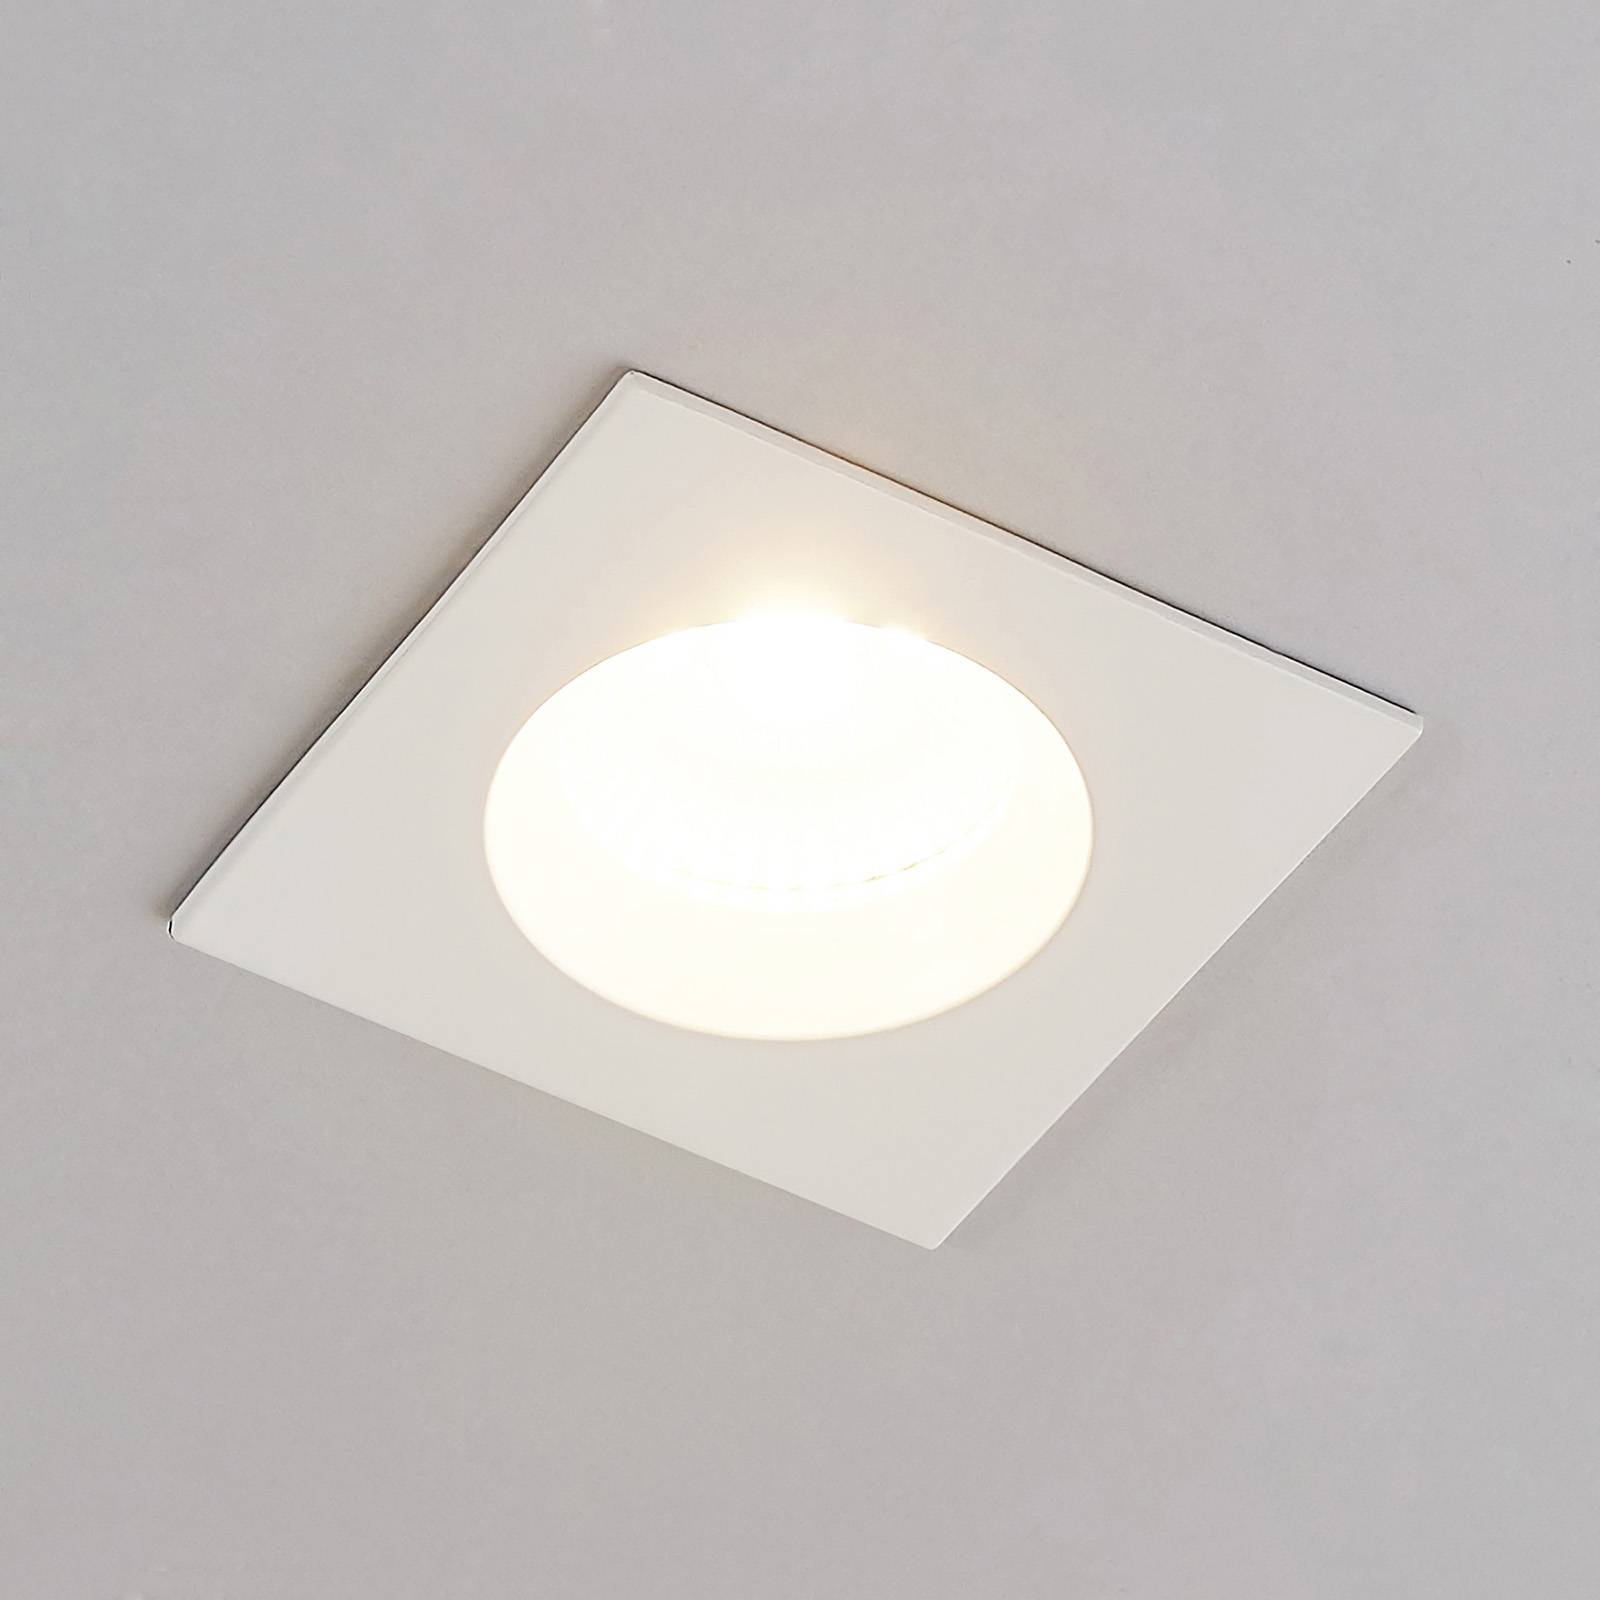 Arcchio Urdin LED-kohdevalo kulmikas IP65, 8,2W